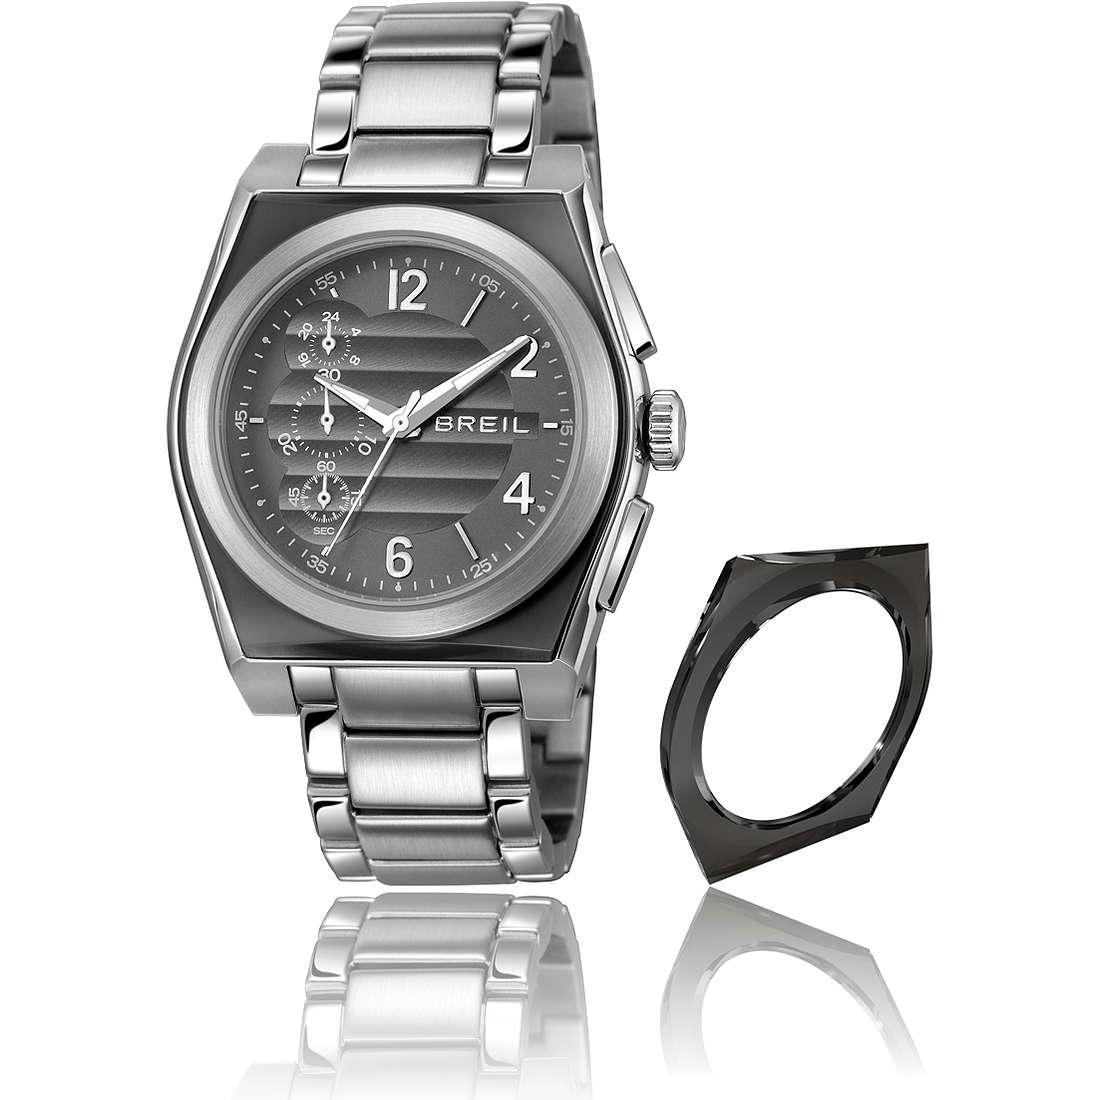 Orologio Cronografo Unisex Breil Escape